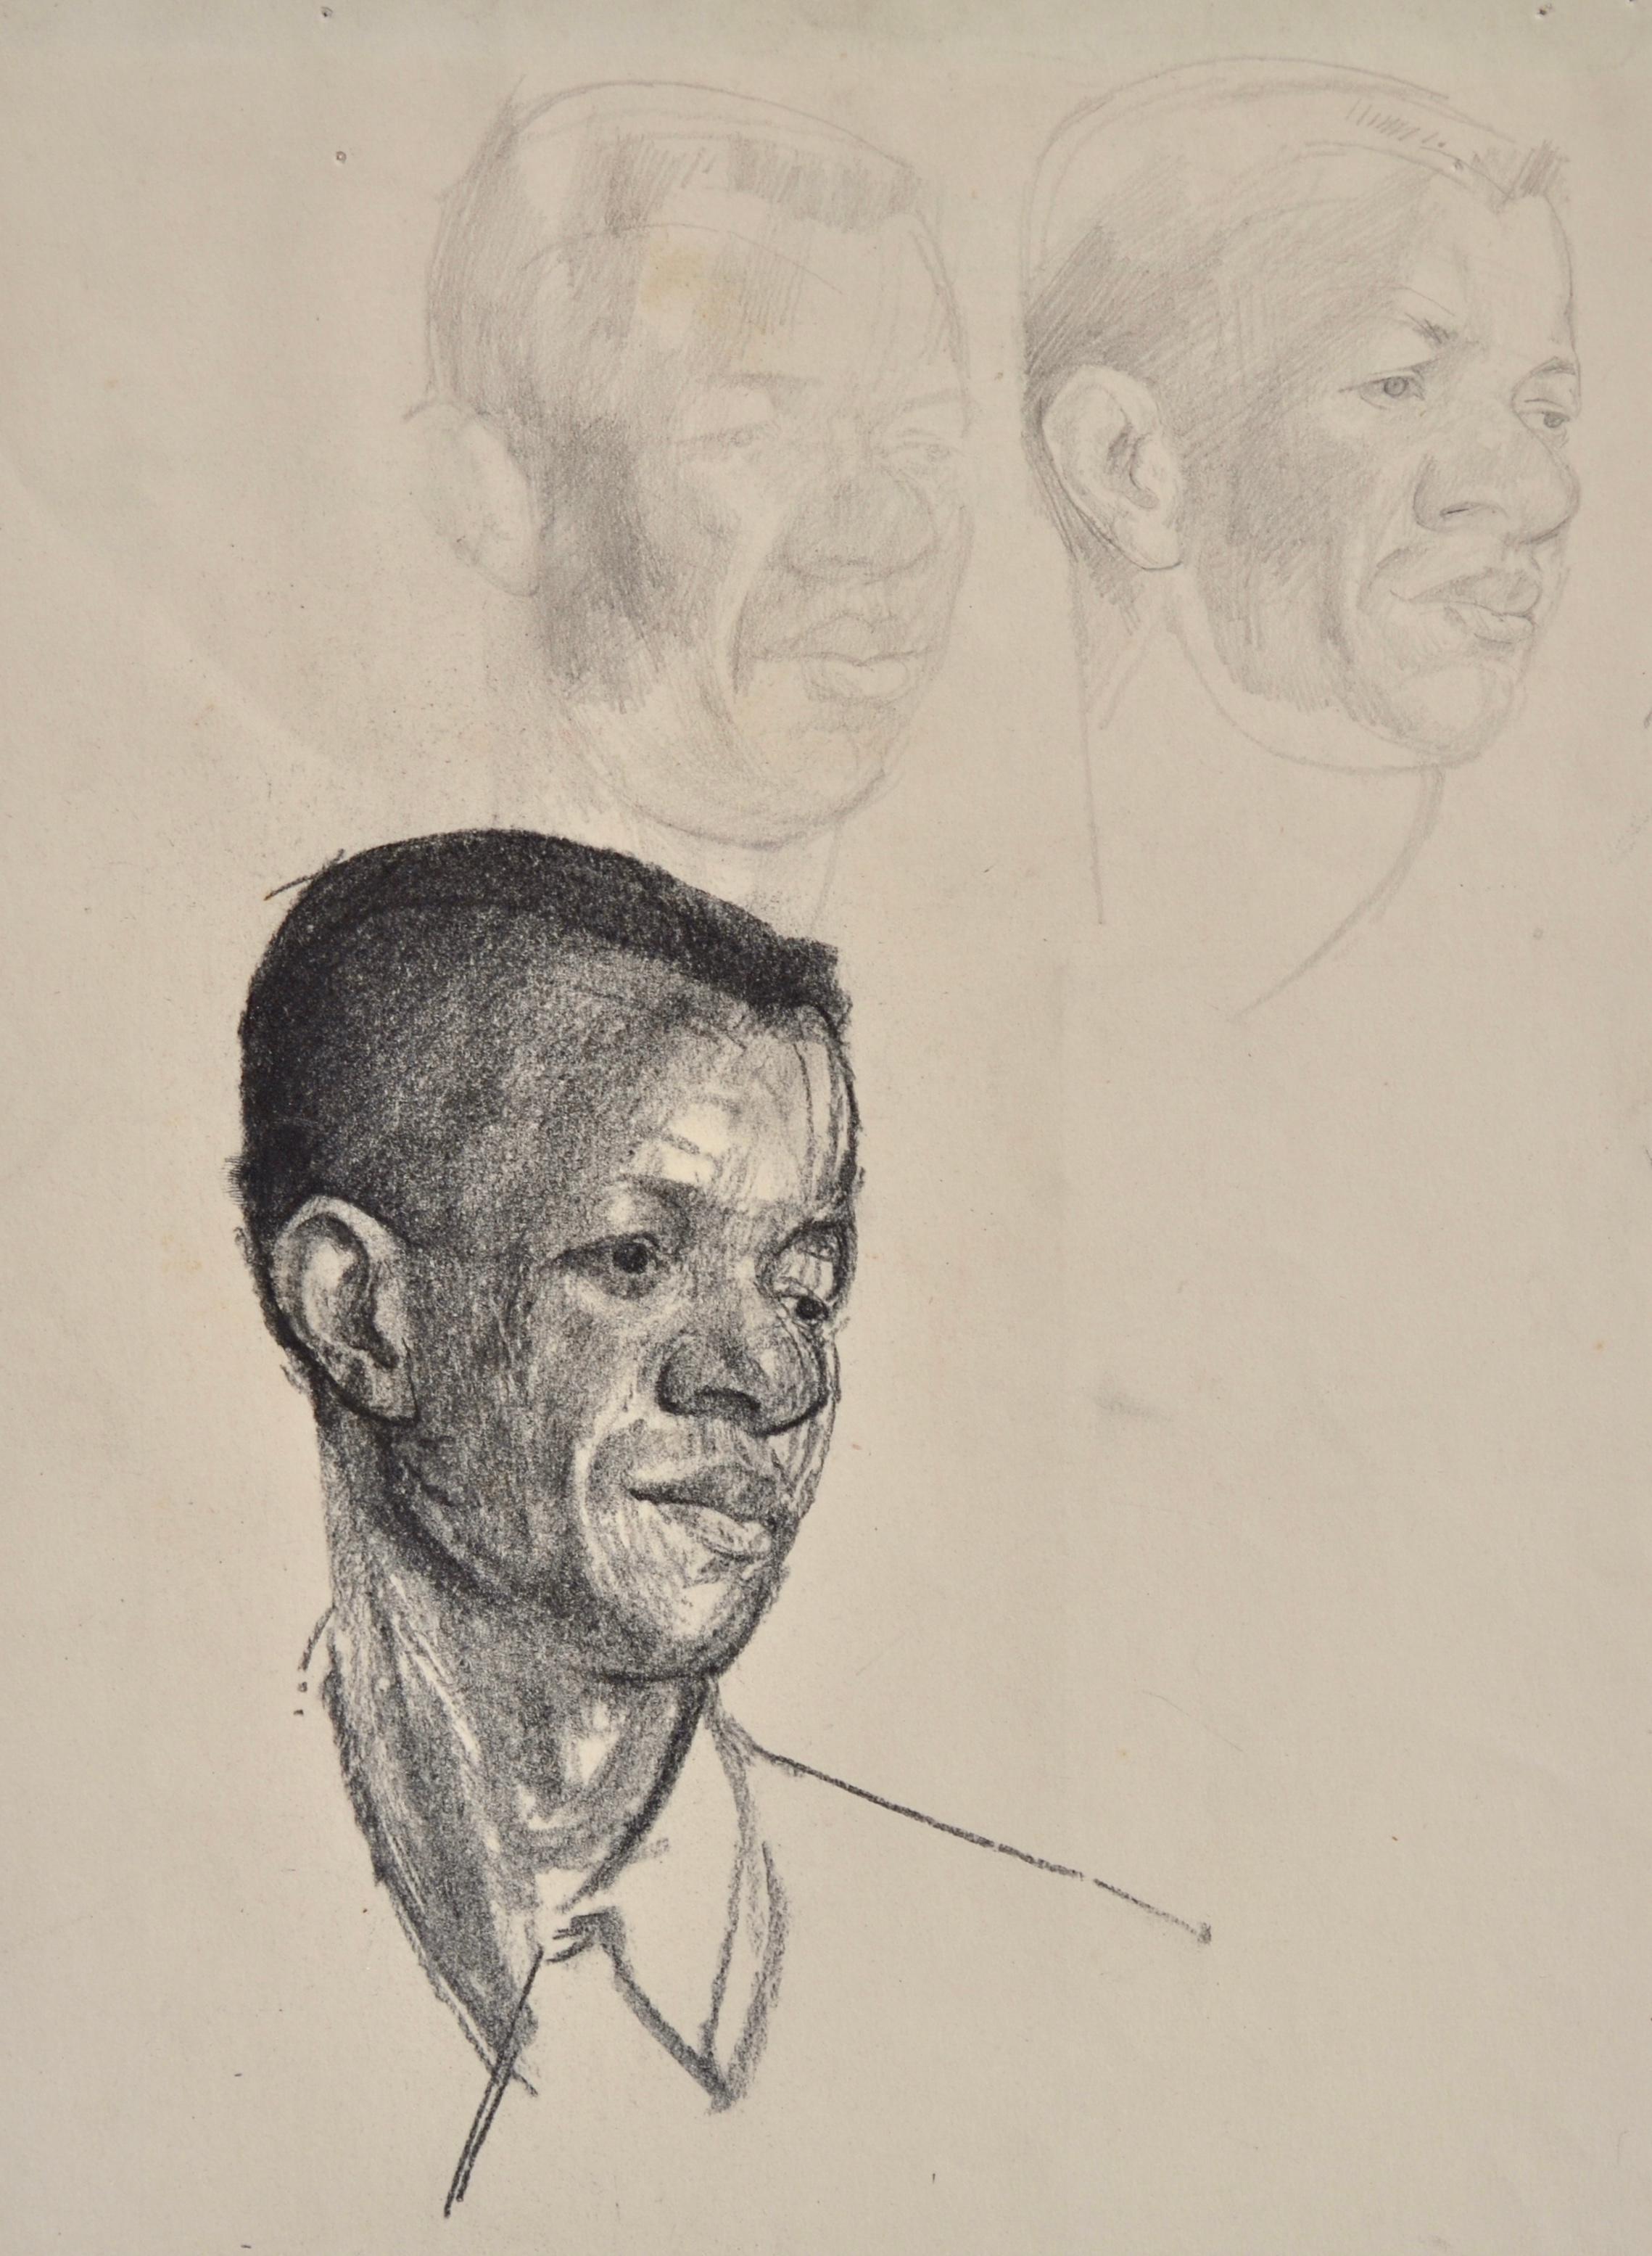 Three studies of a Head - Pencil Drawing by British artist John Sergeant